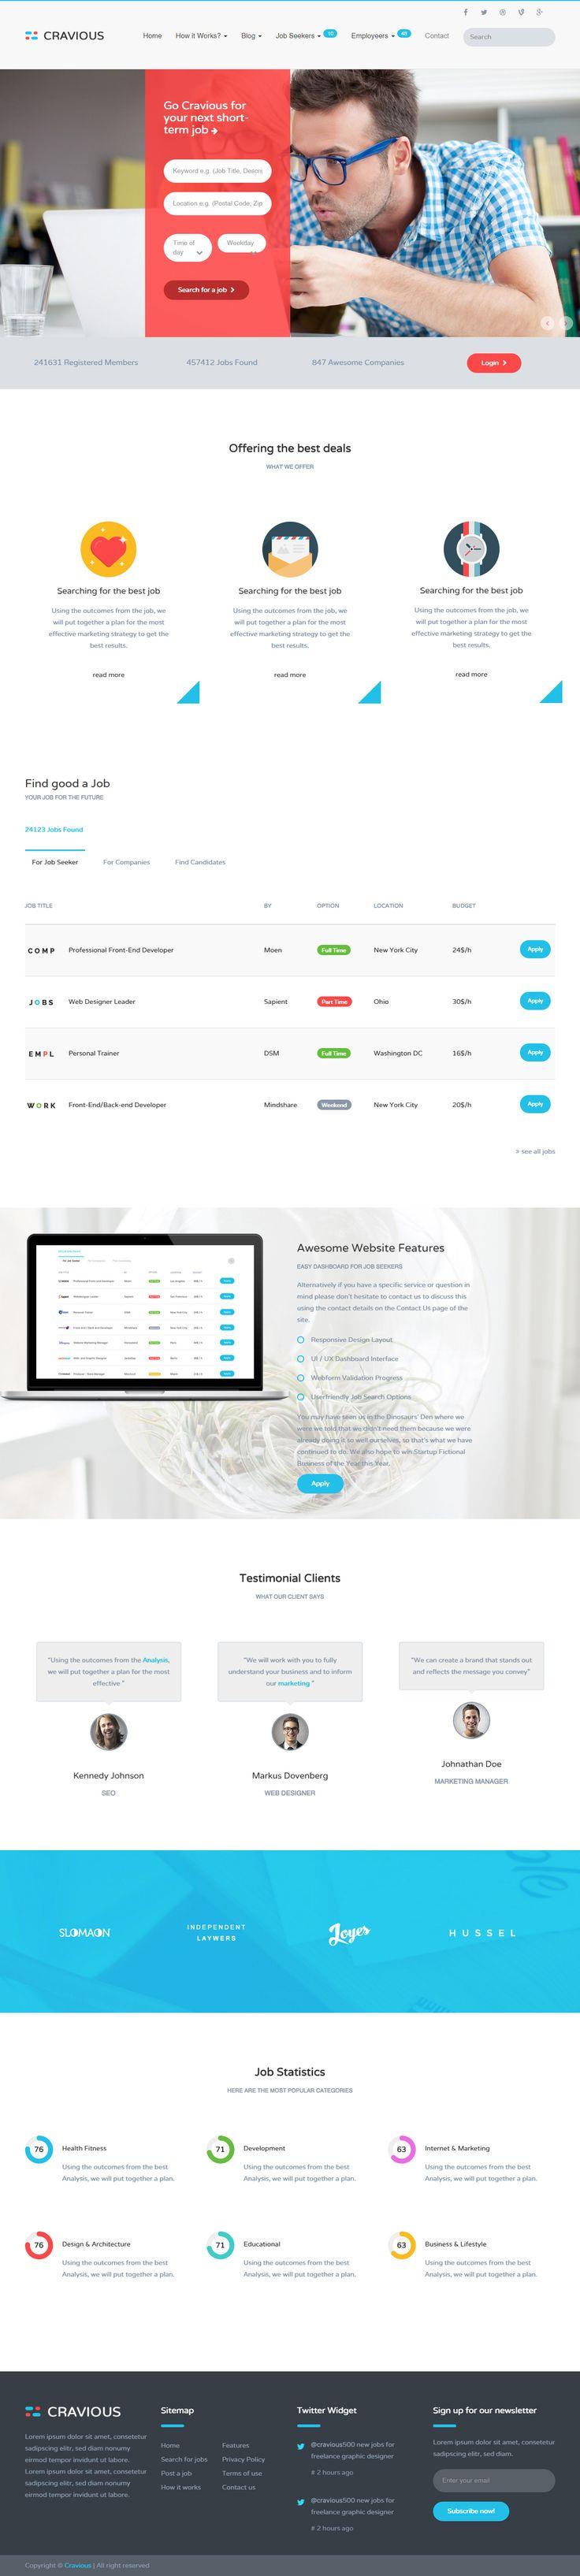 best ideas about job portal website layout food cravious is premium responsive retina html5 jobboard template bootstrap 3 framework seo